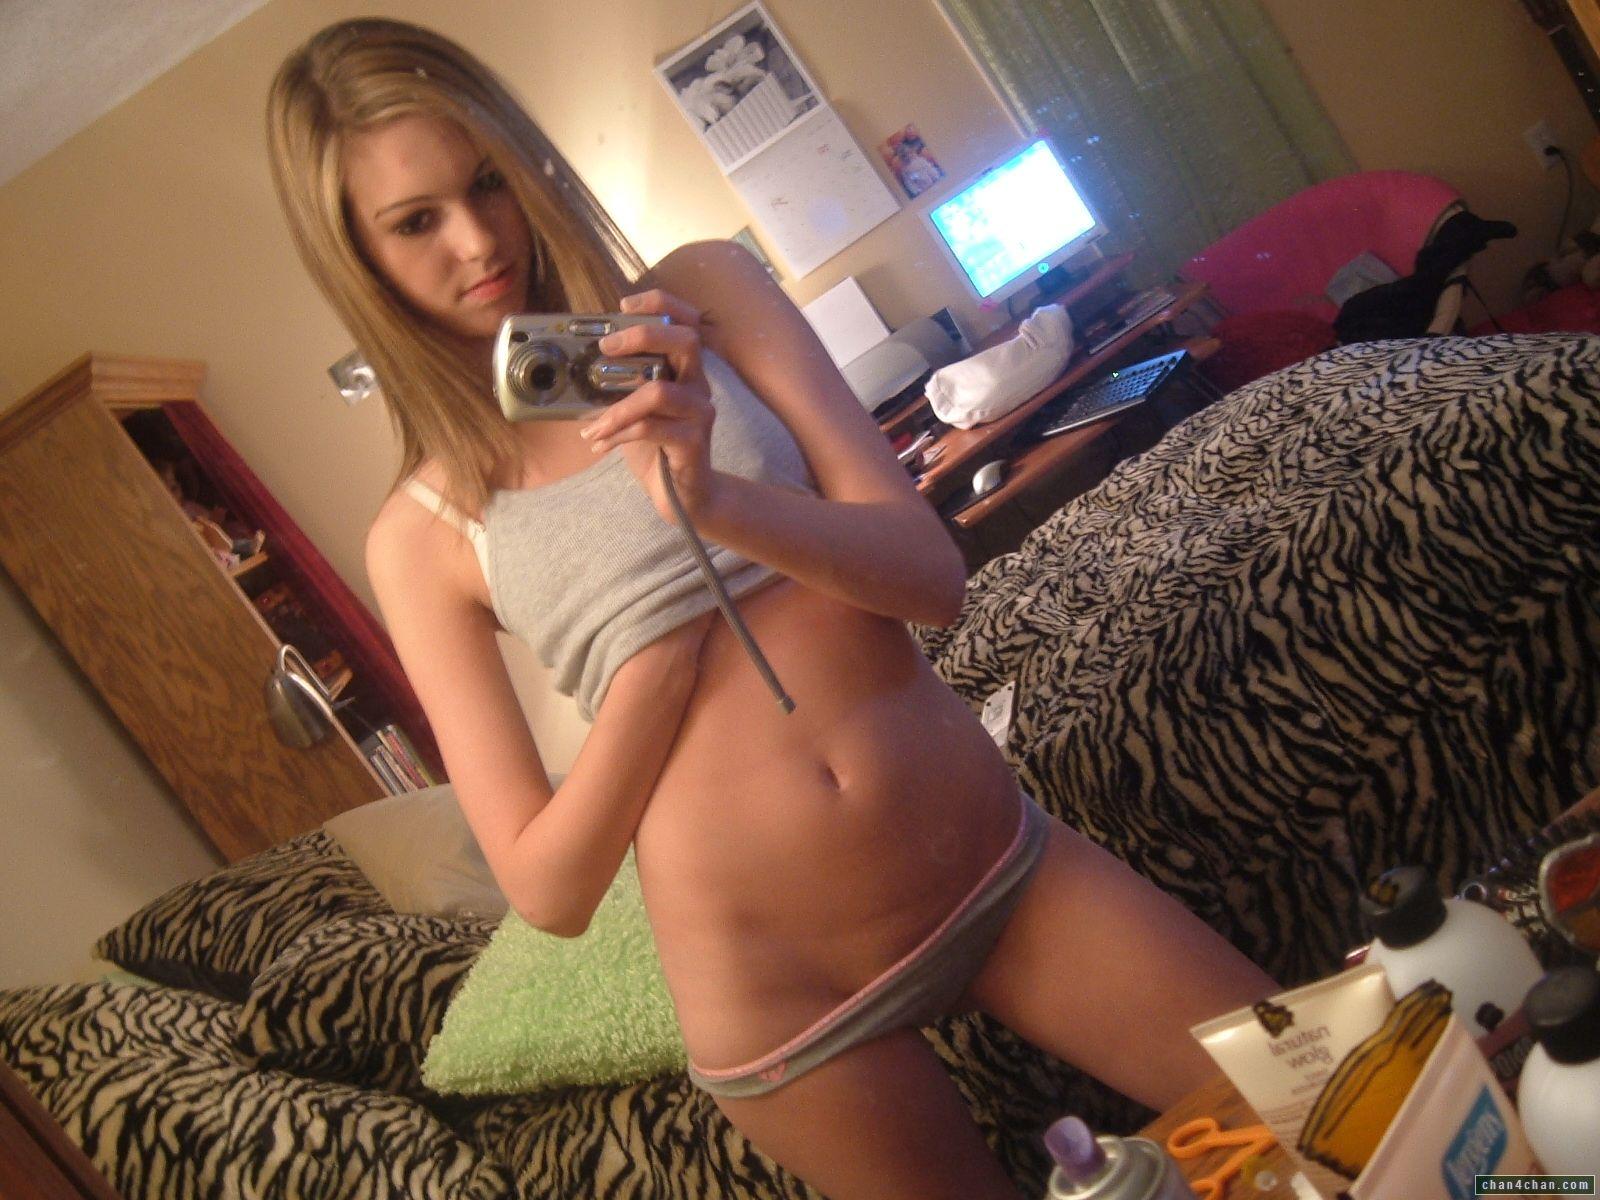 Real teen girls self pics